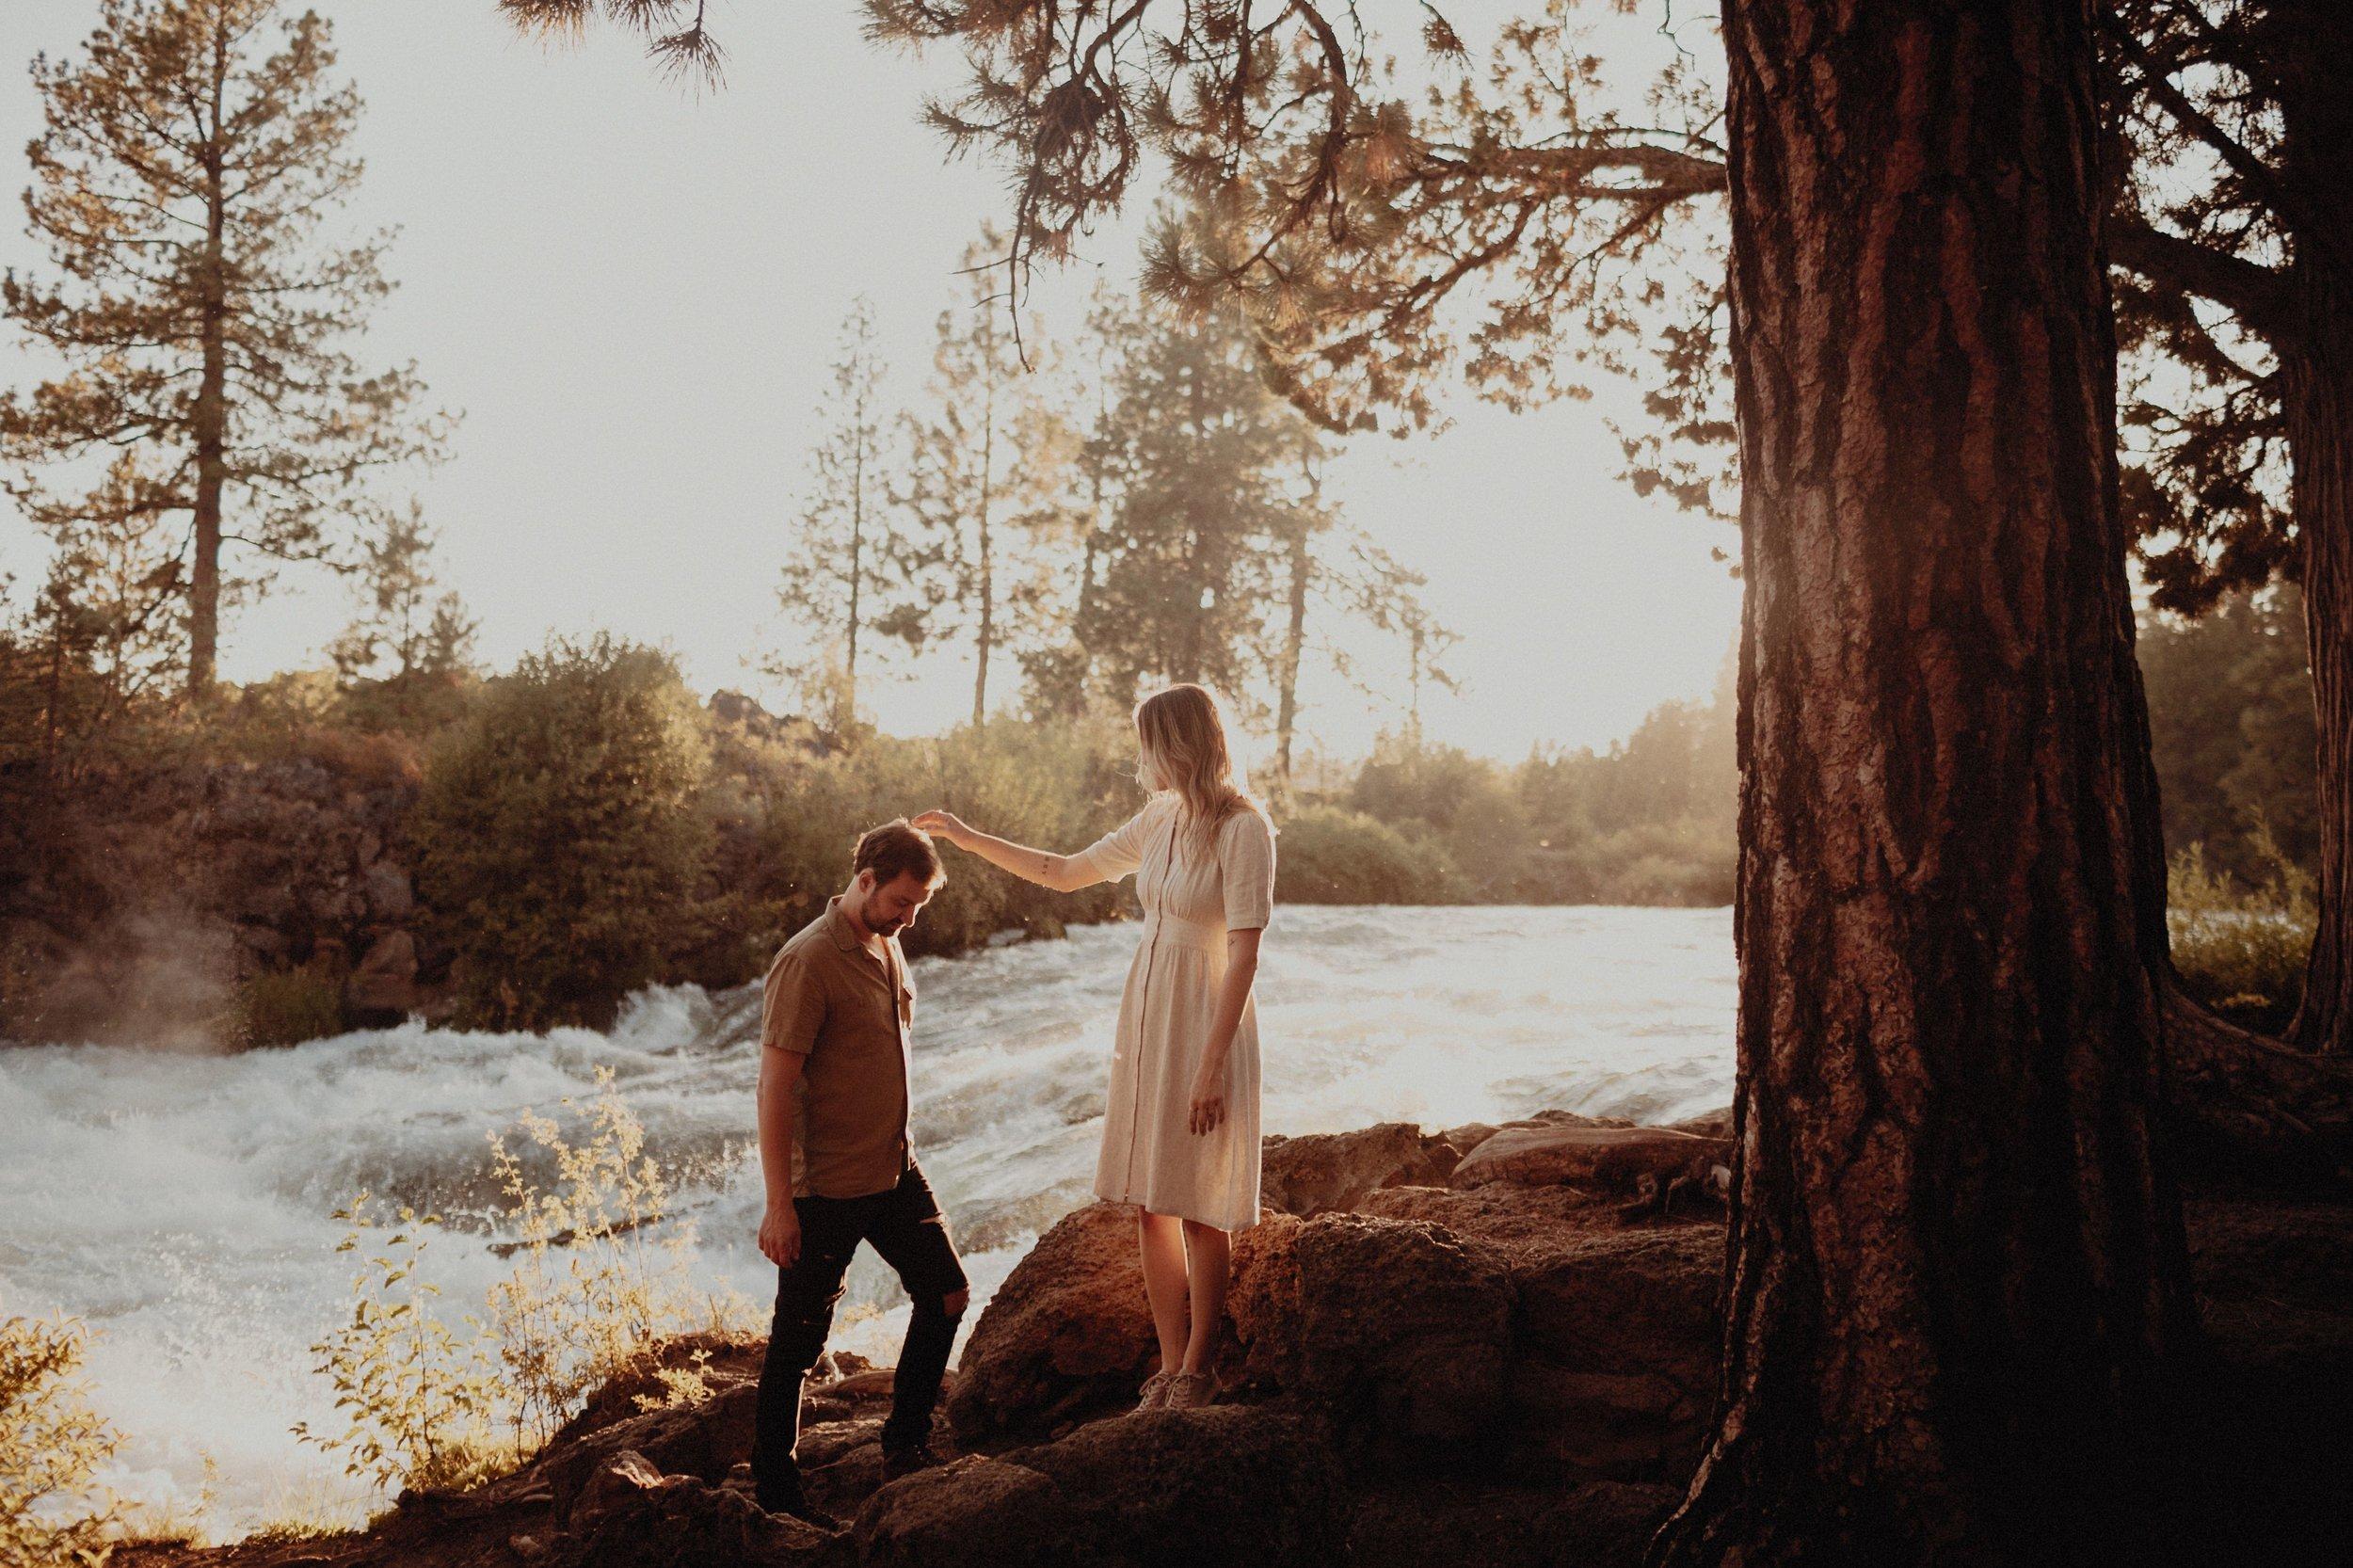 Dillon Falls Couple Shoot.Lauren Apel Photo45.JPG